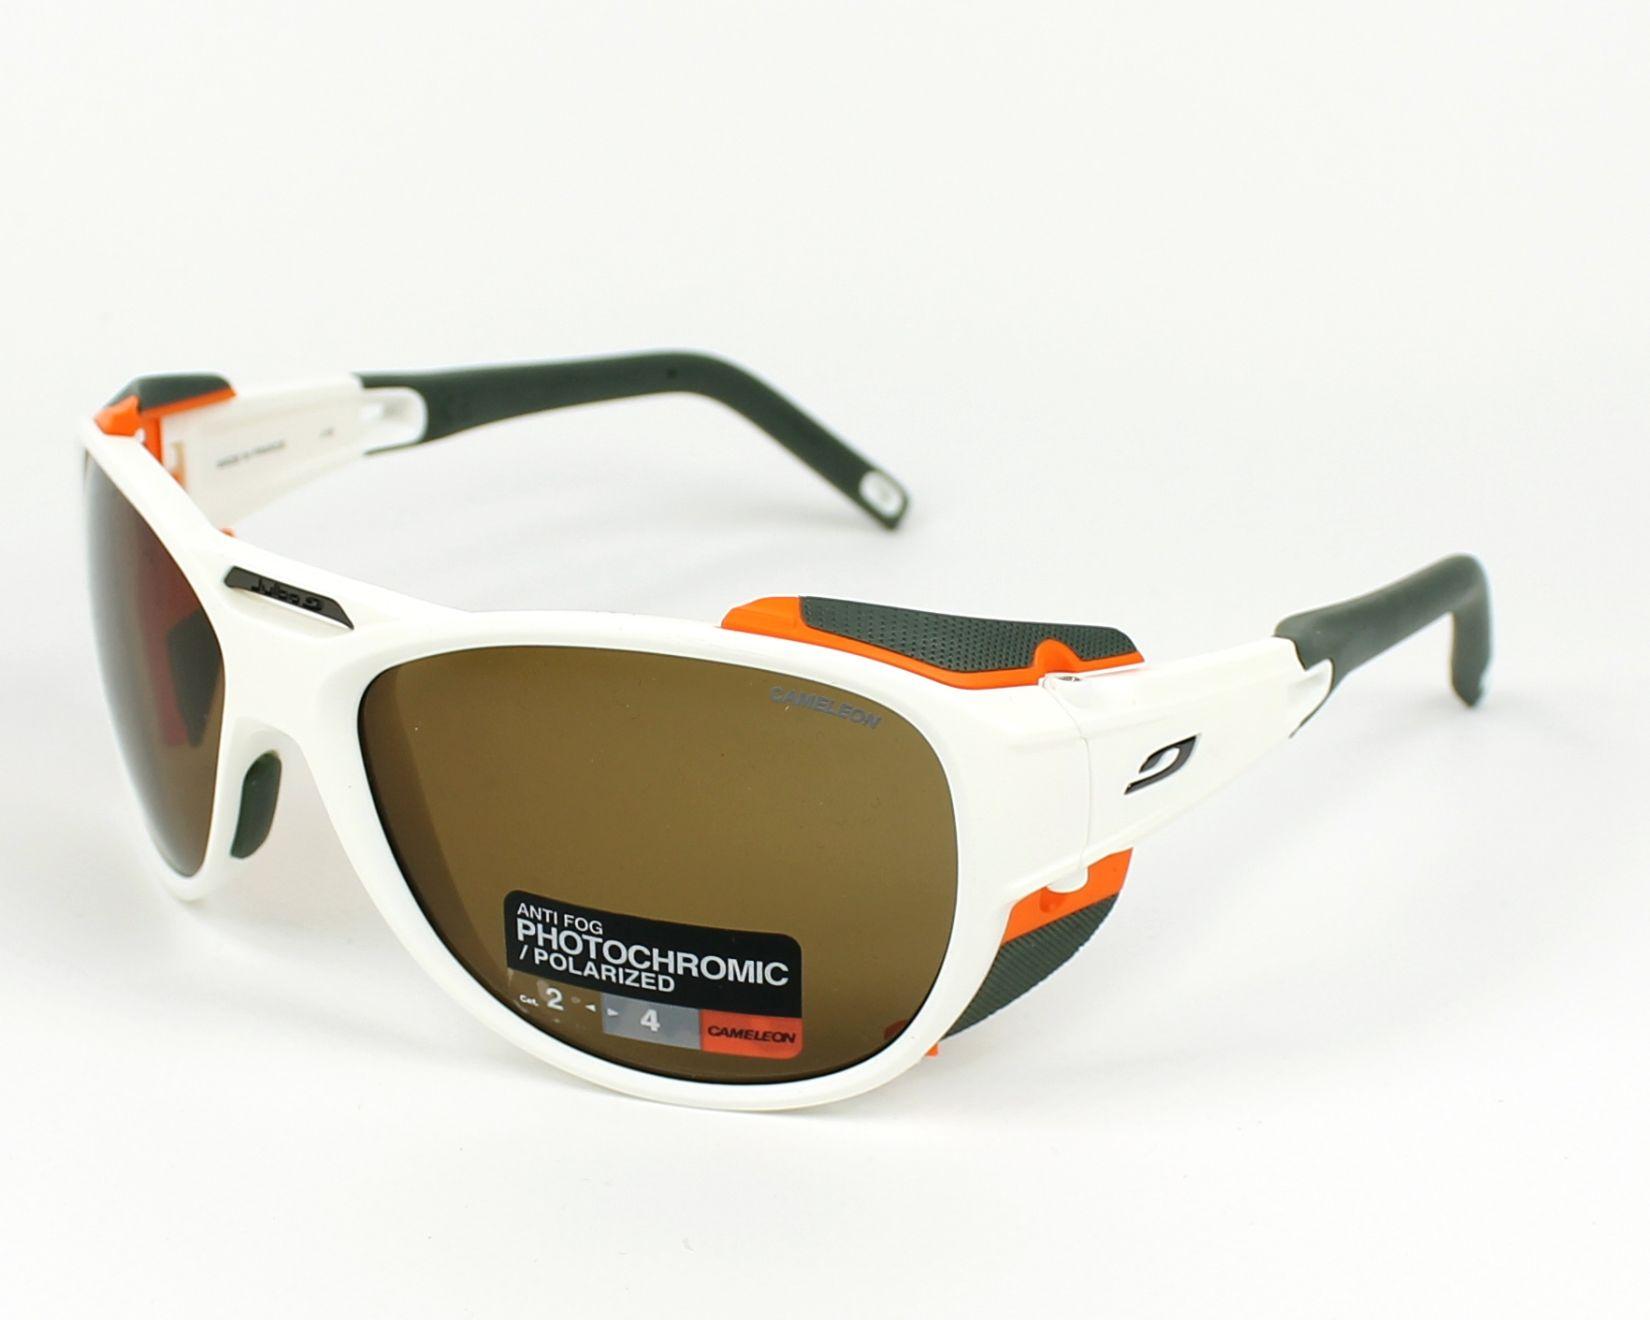 a2b625ed06 Buy Julbo Explorer 2.0 Cameleon Sunglasses - Bitterroot Public Library